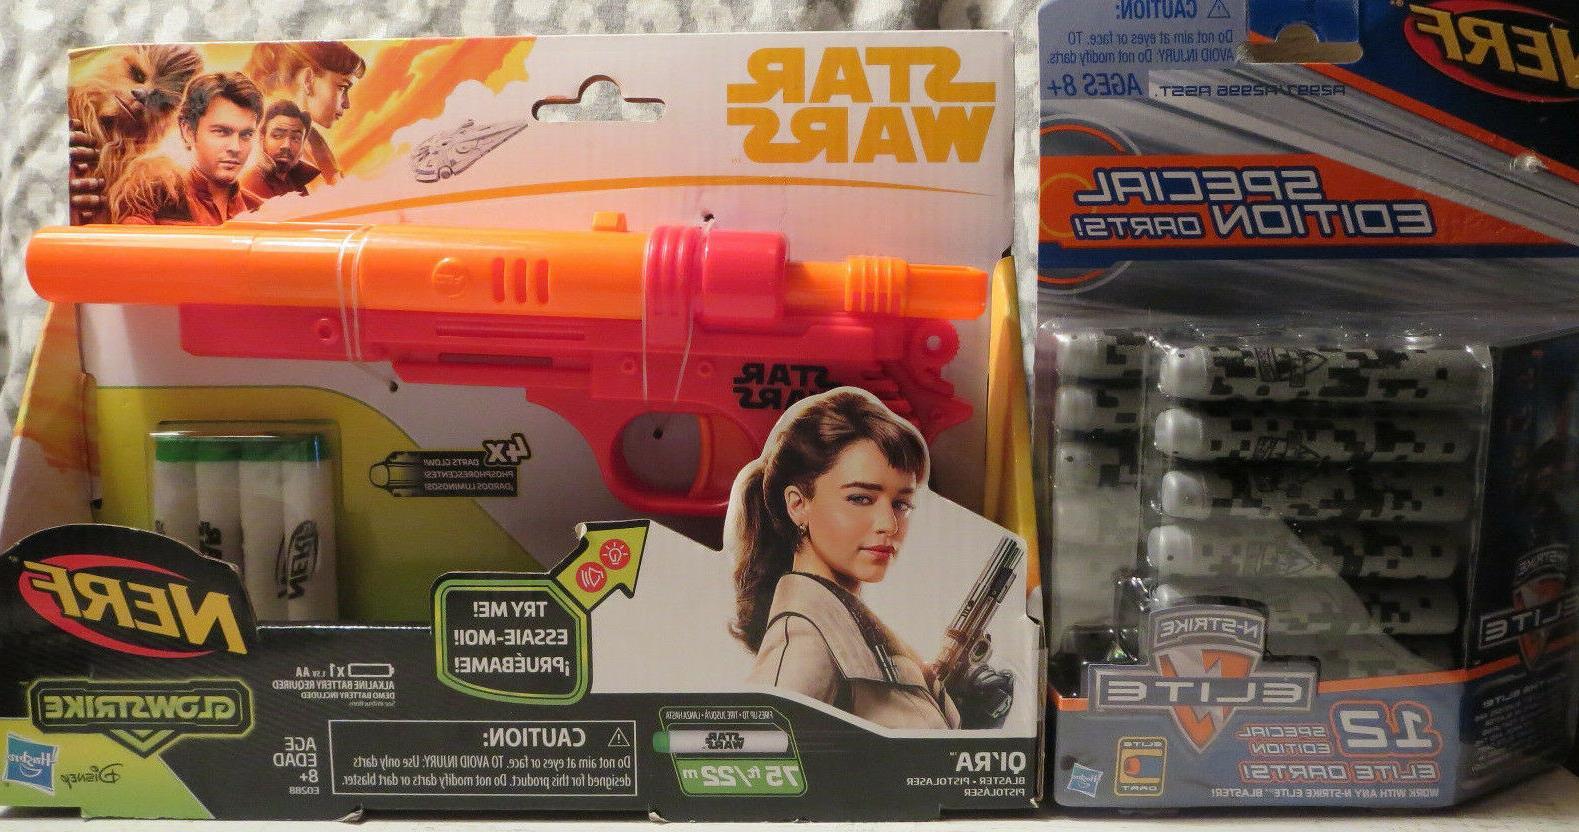 star wars qi ra solo glowstrikeblaster gun